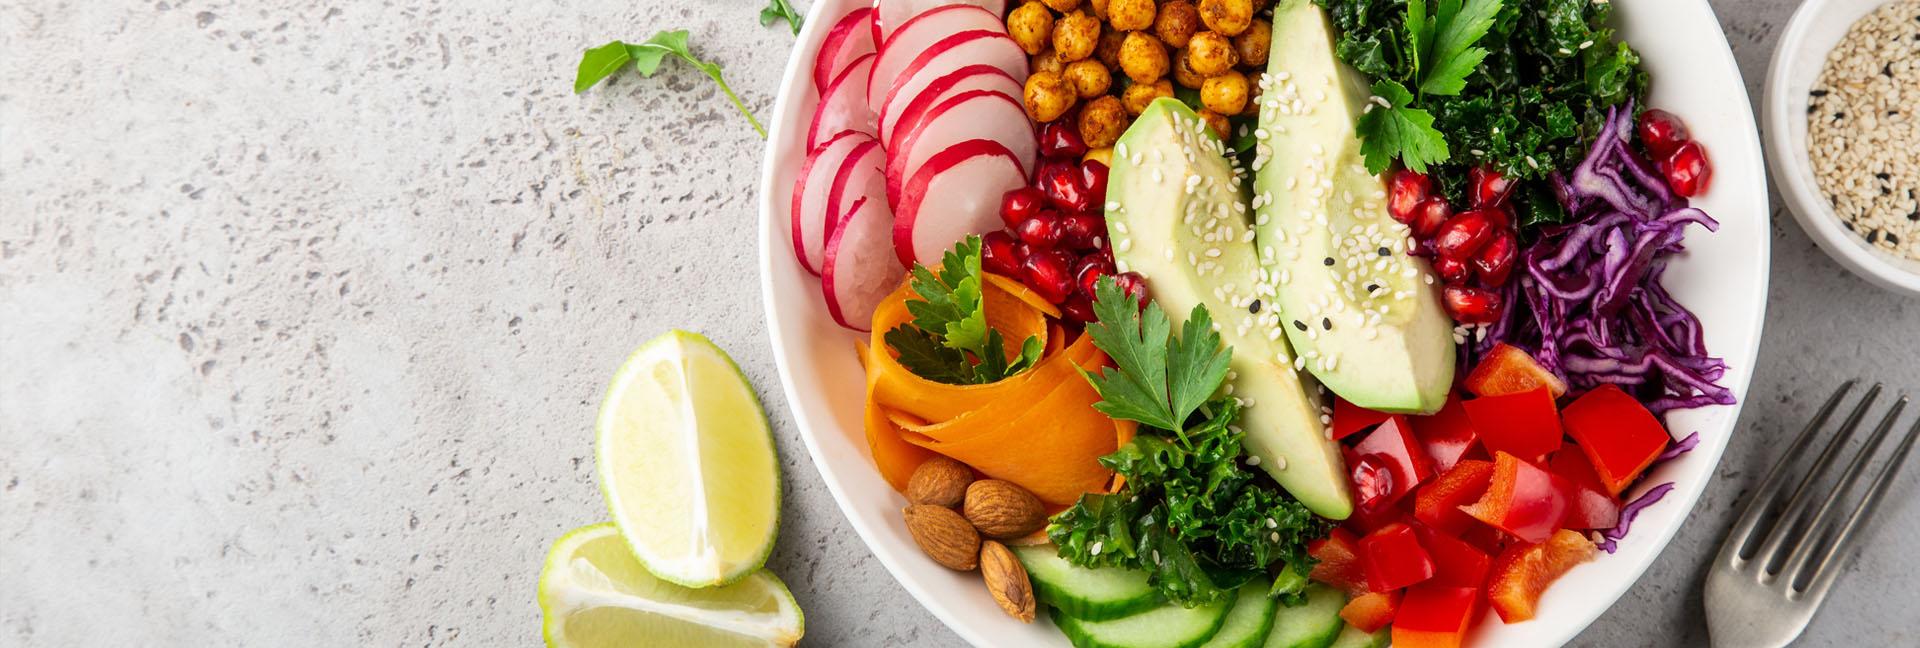 Ernährung, Gemüse, Bowl Salat